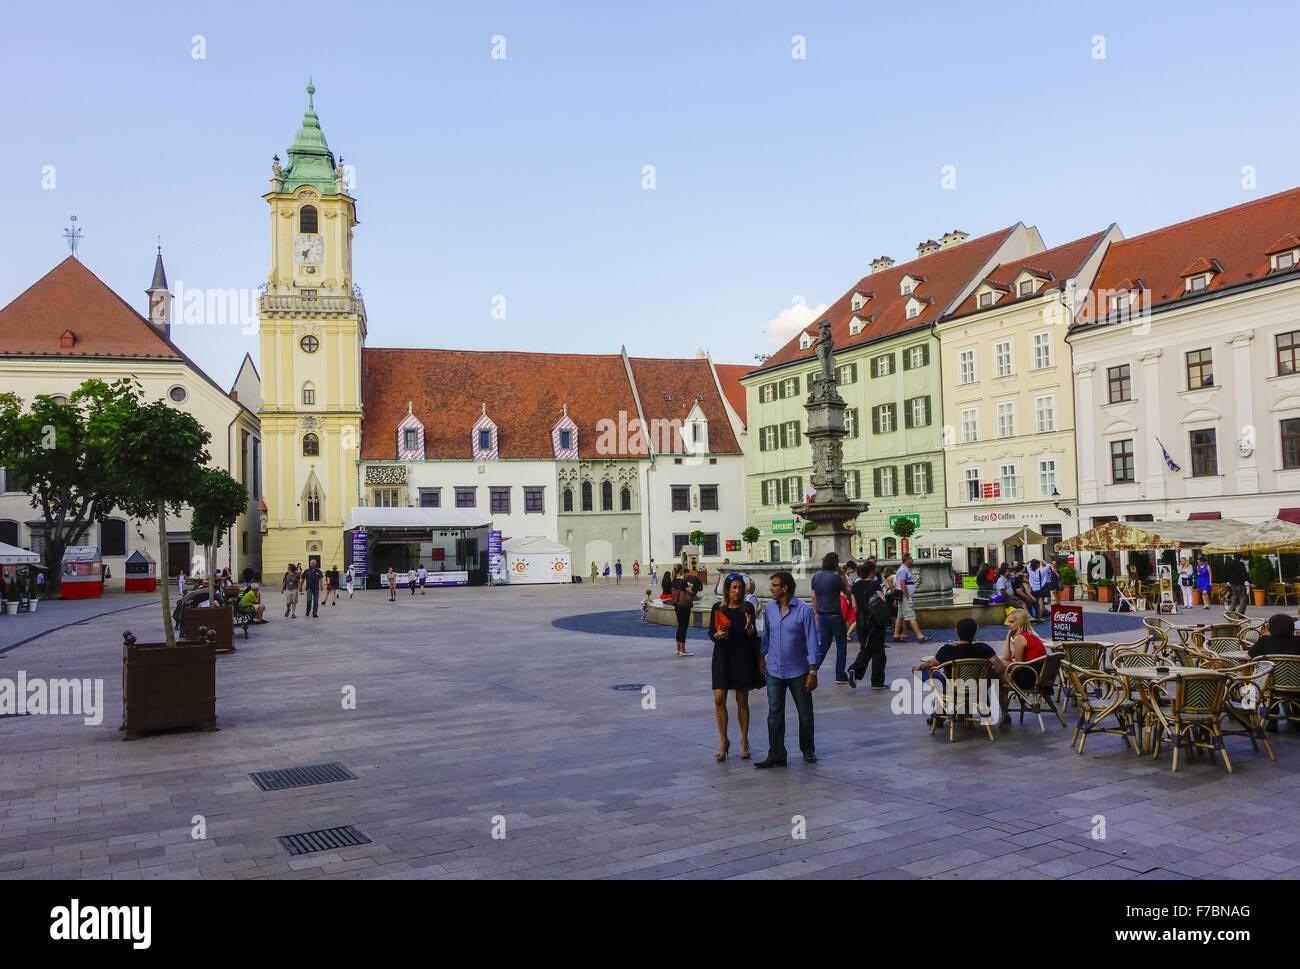 Slovakia, Bratislava, Pressburg, capital city, old town, city center - Stock Image